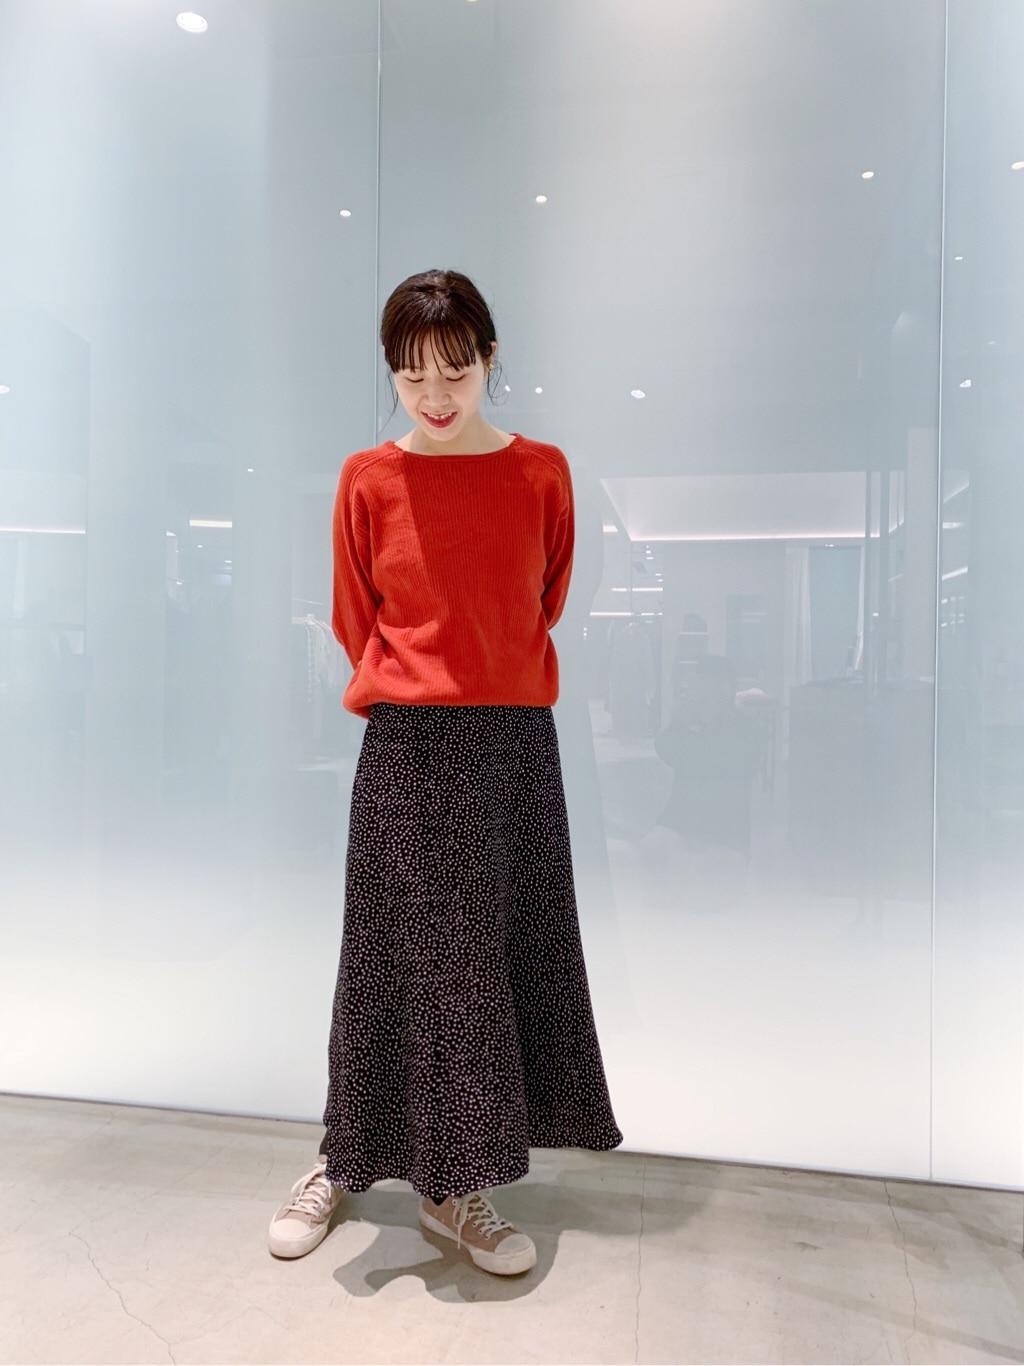 note et silence. 日本橋��島屋S.C. 身長:162cm 2019.12.08